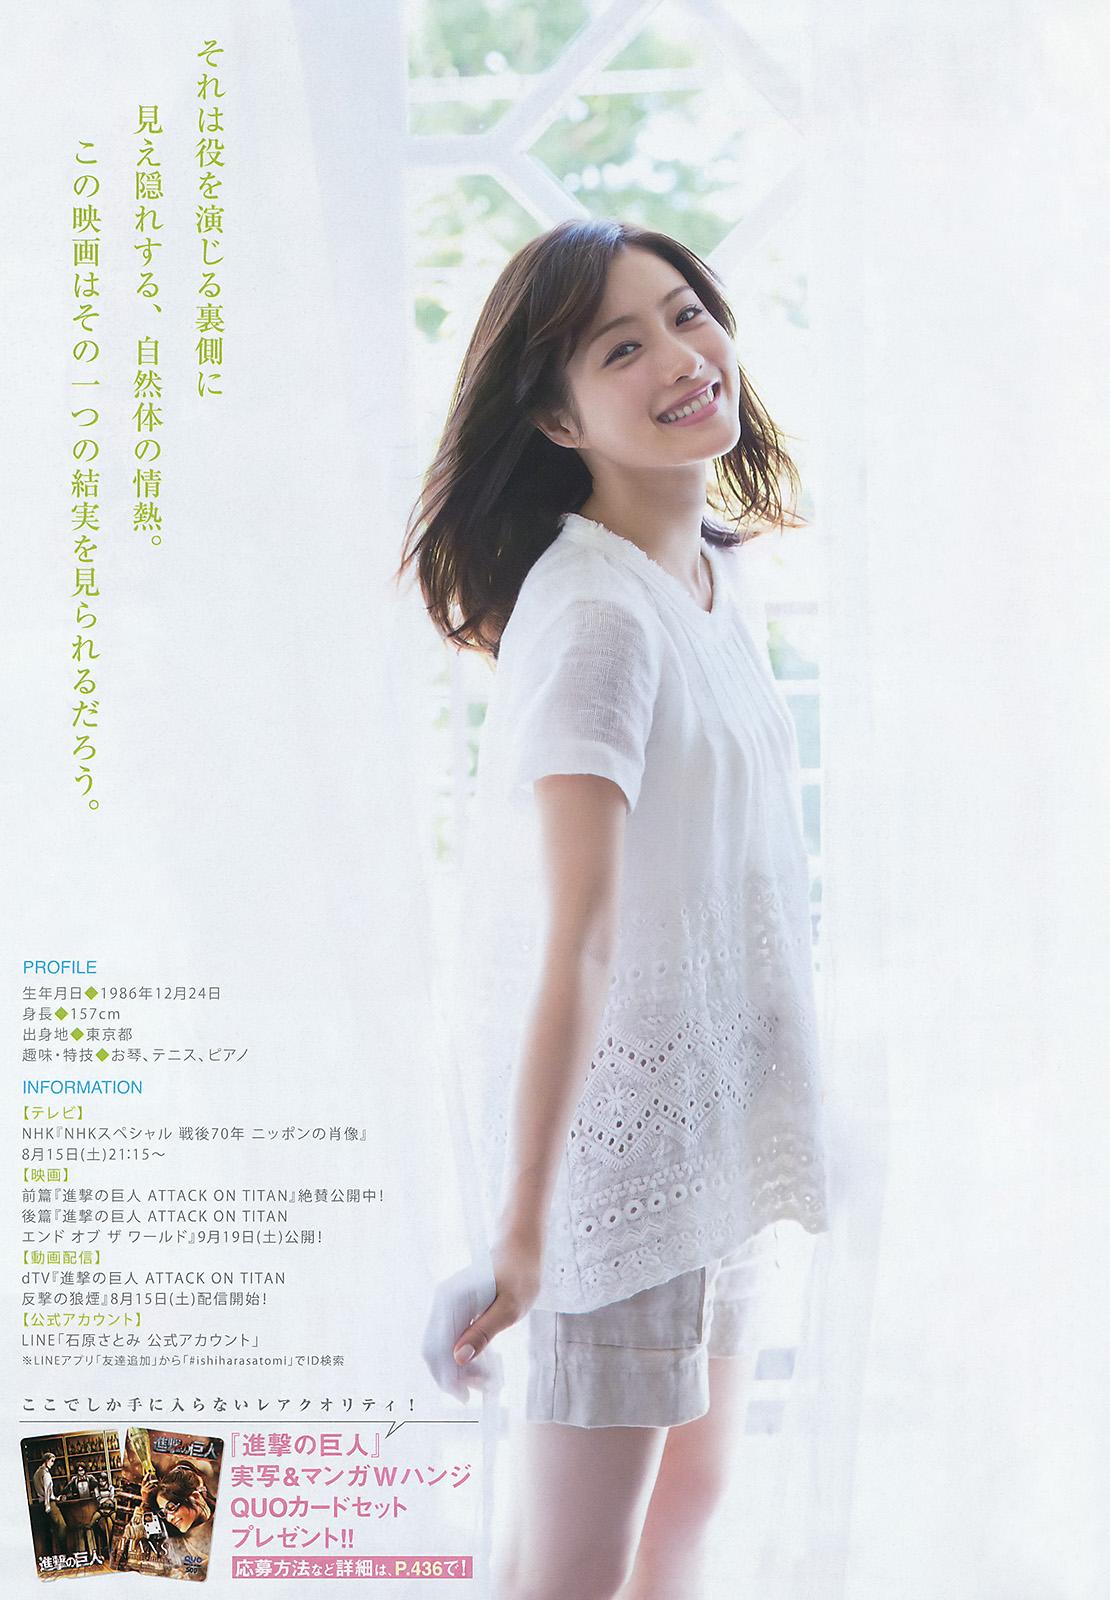 http://upimg.tokimeki-s.com/2015/08/55ca228400365.jpg